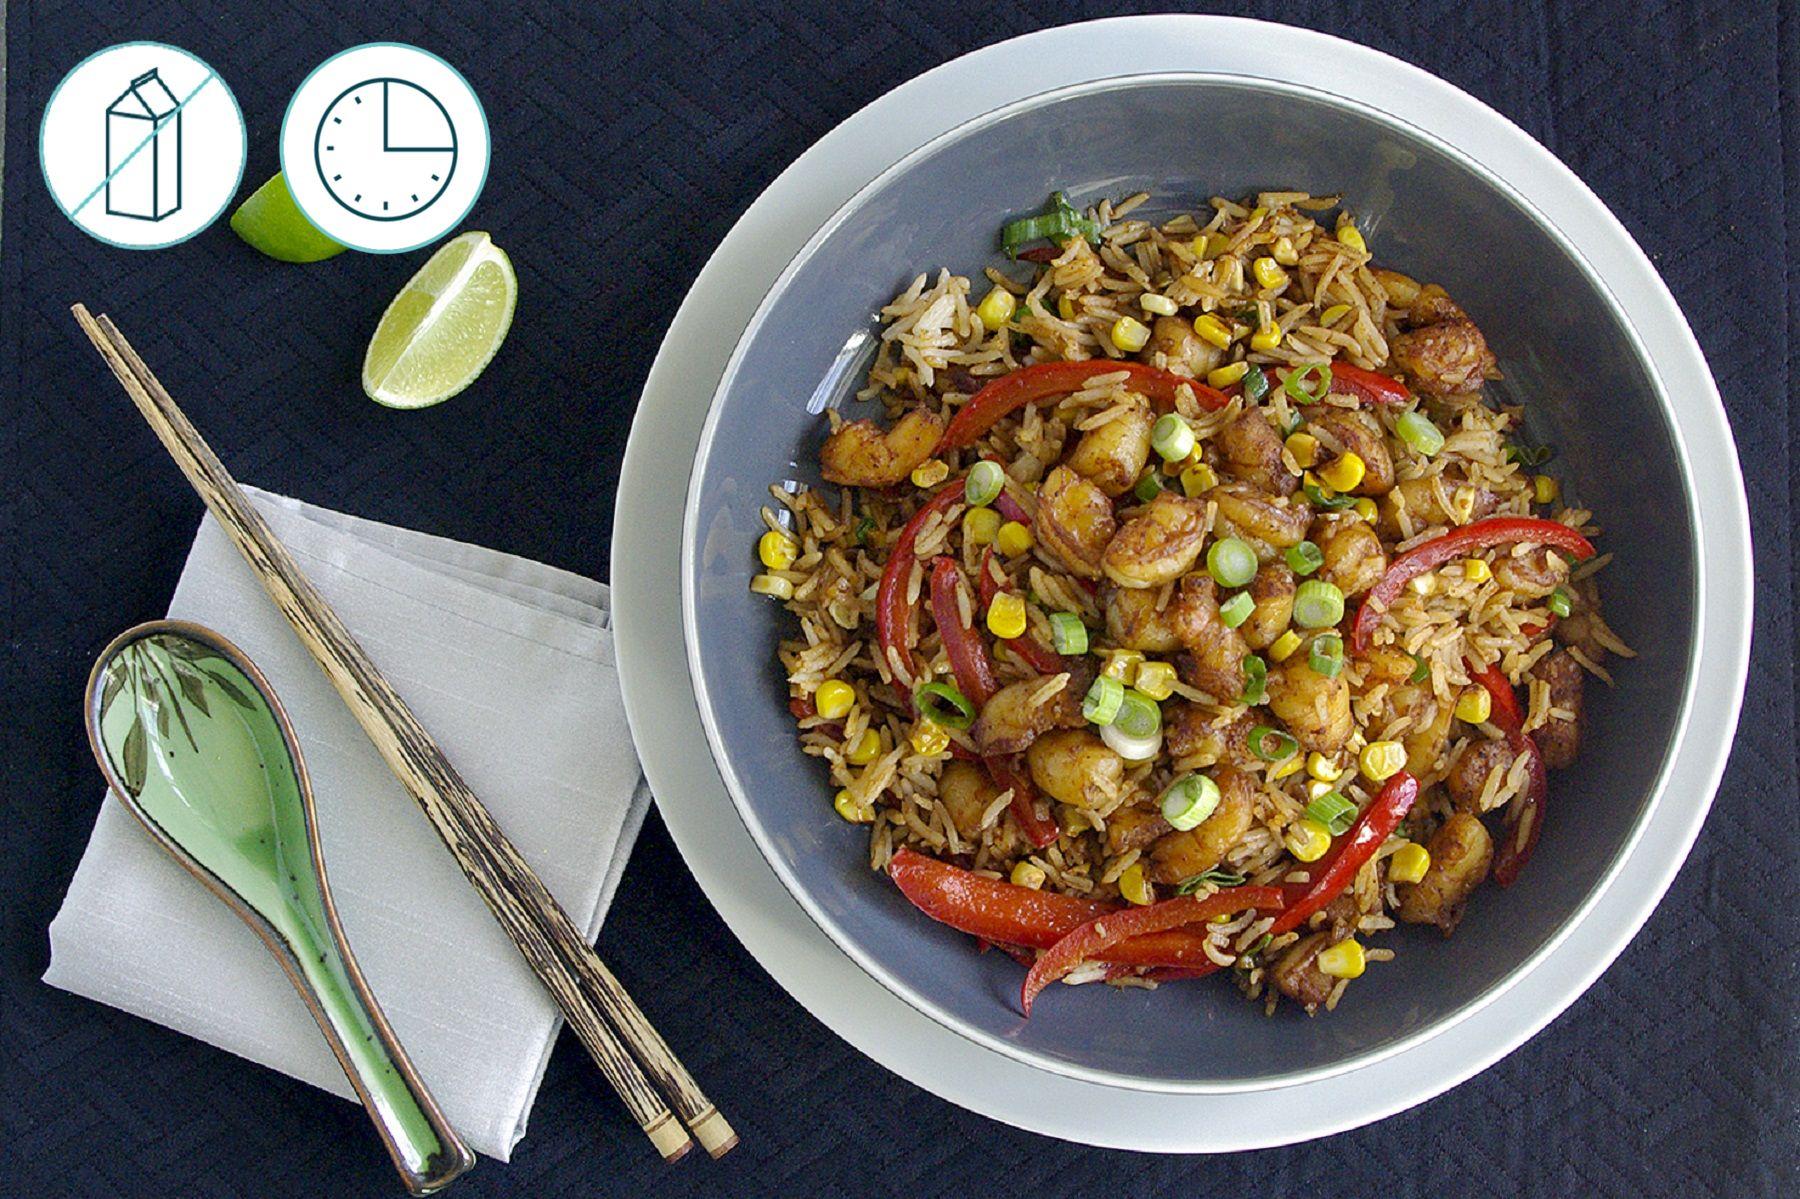 Pin on good food recipes